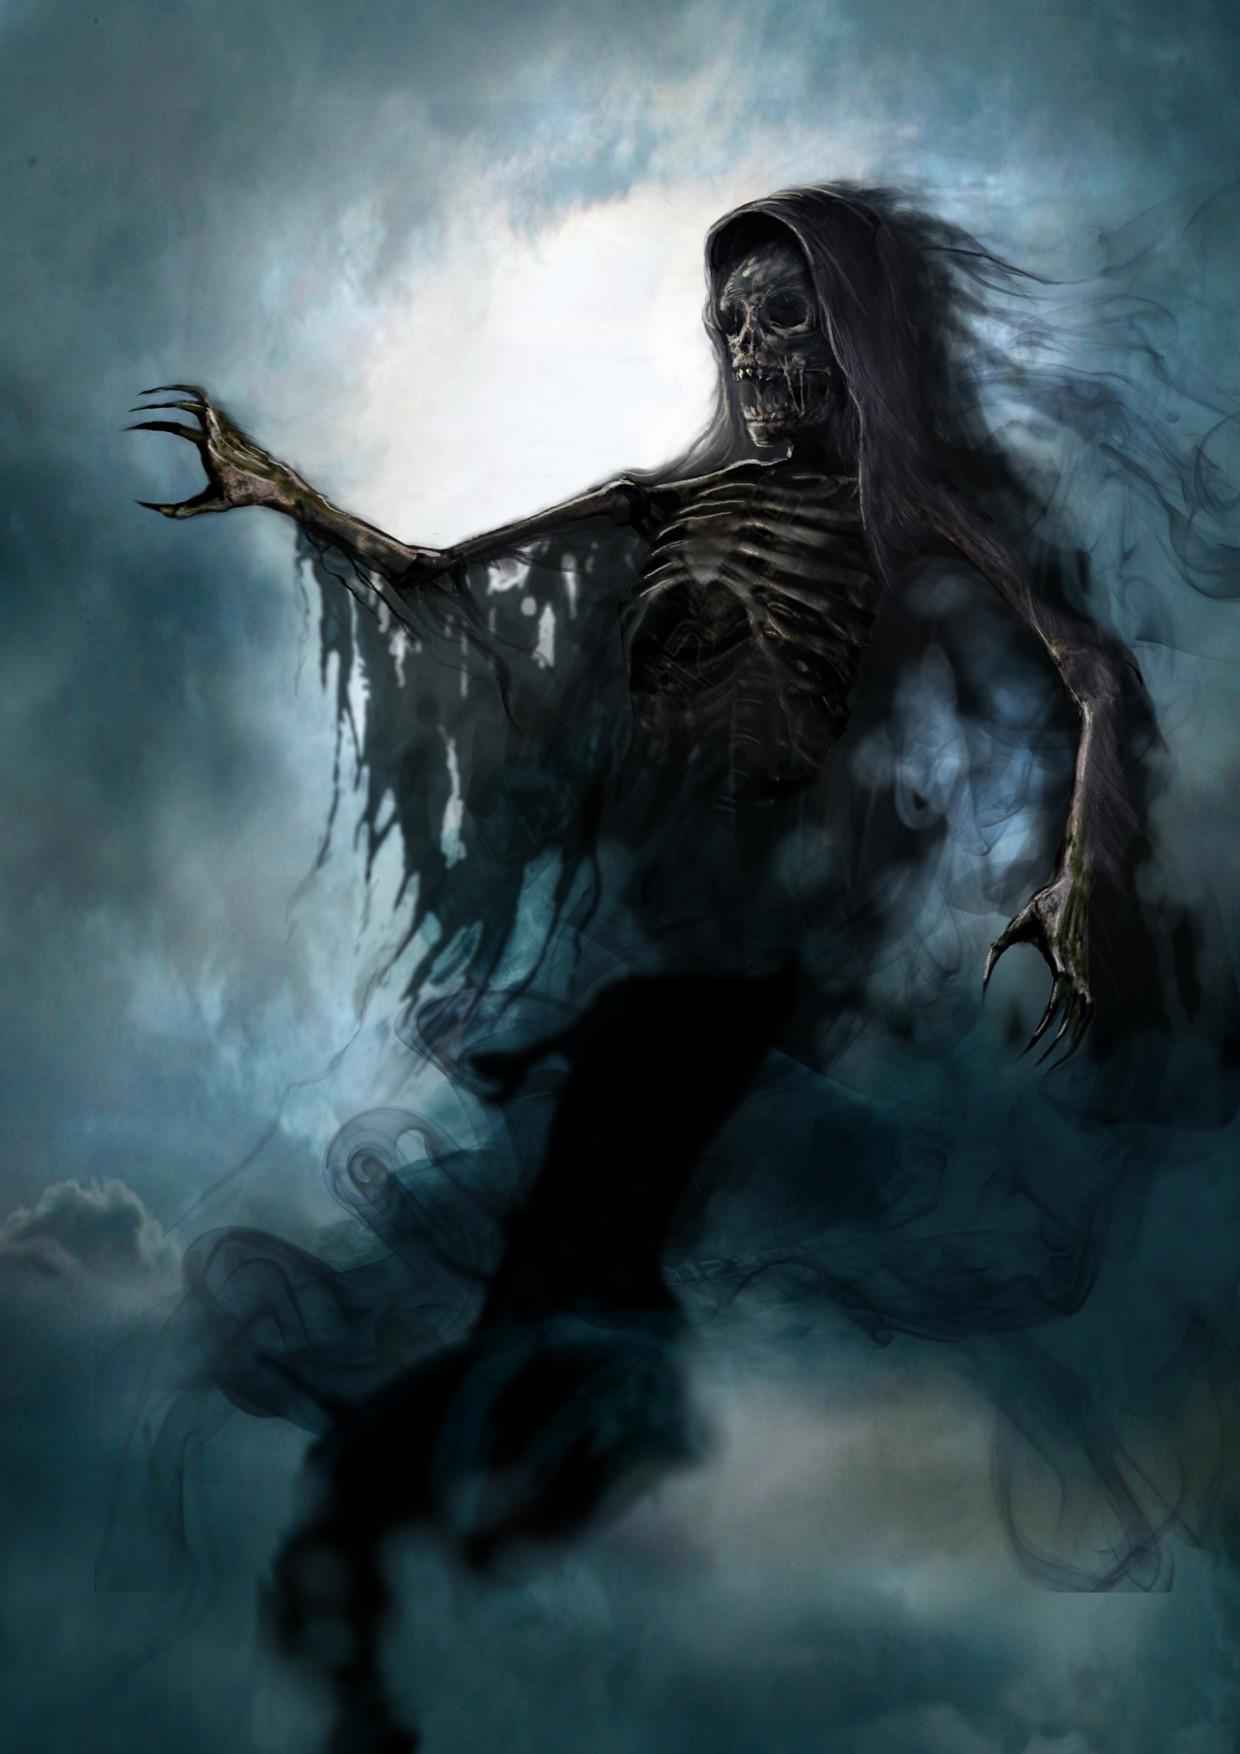 PhantomBlackWraith